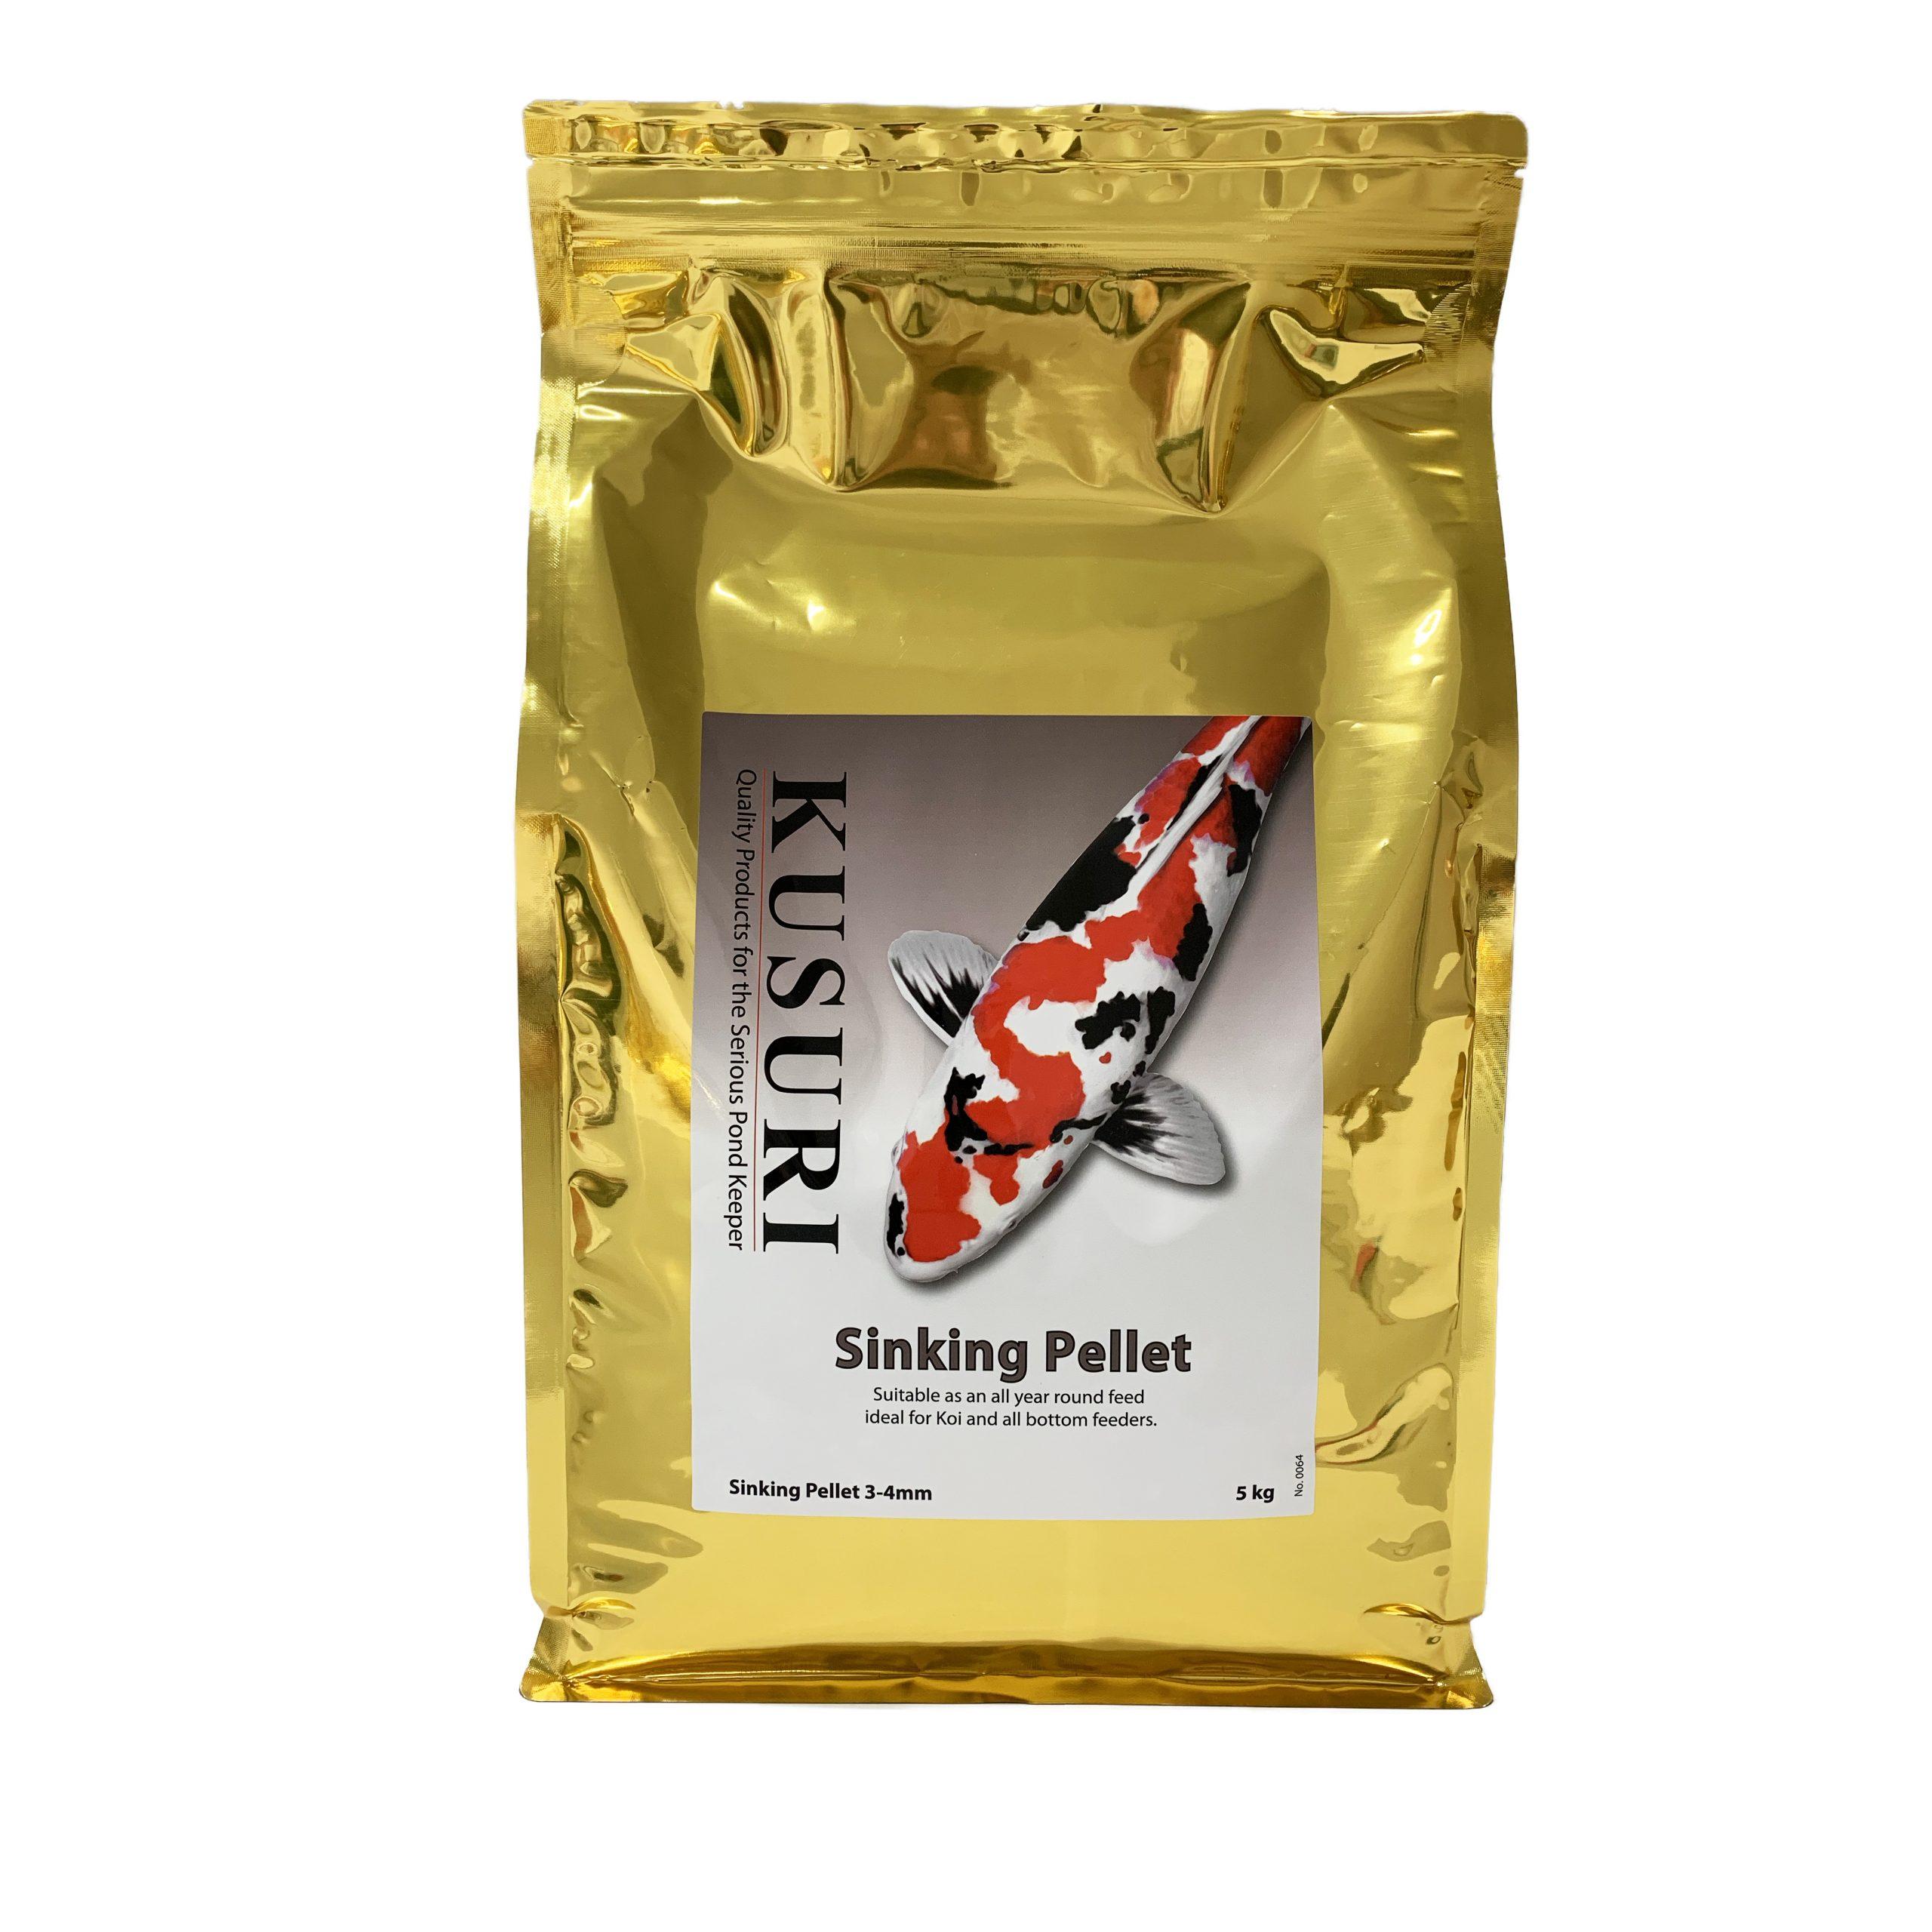 Kusuri Sinking Pellet Food Kusuri Products